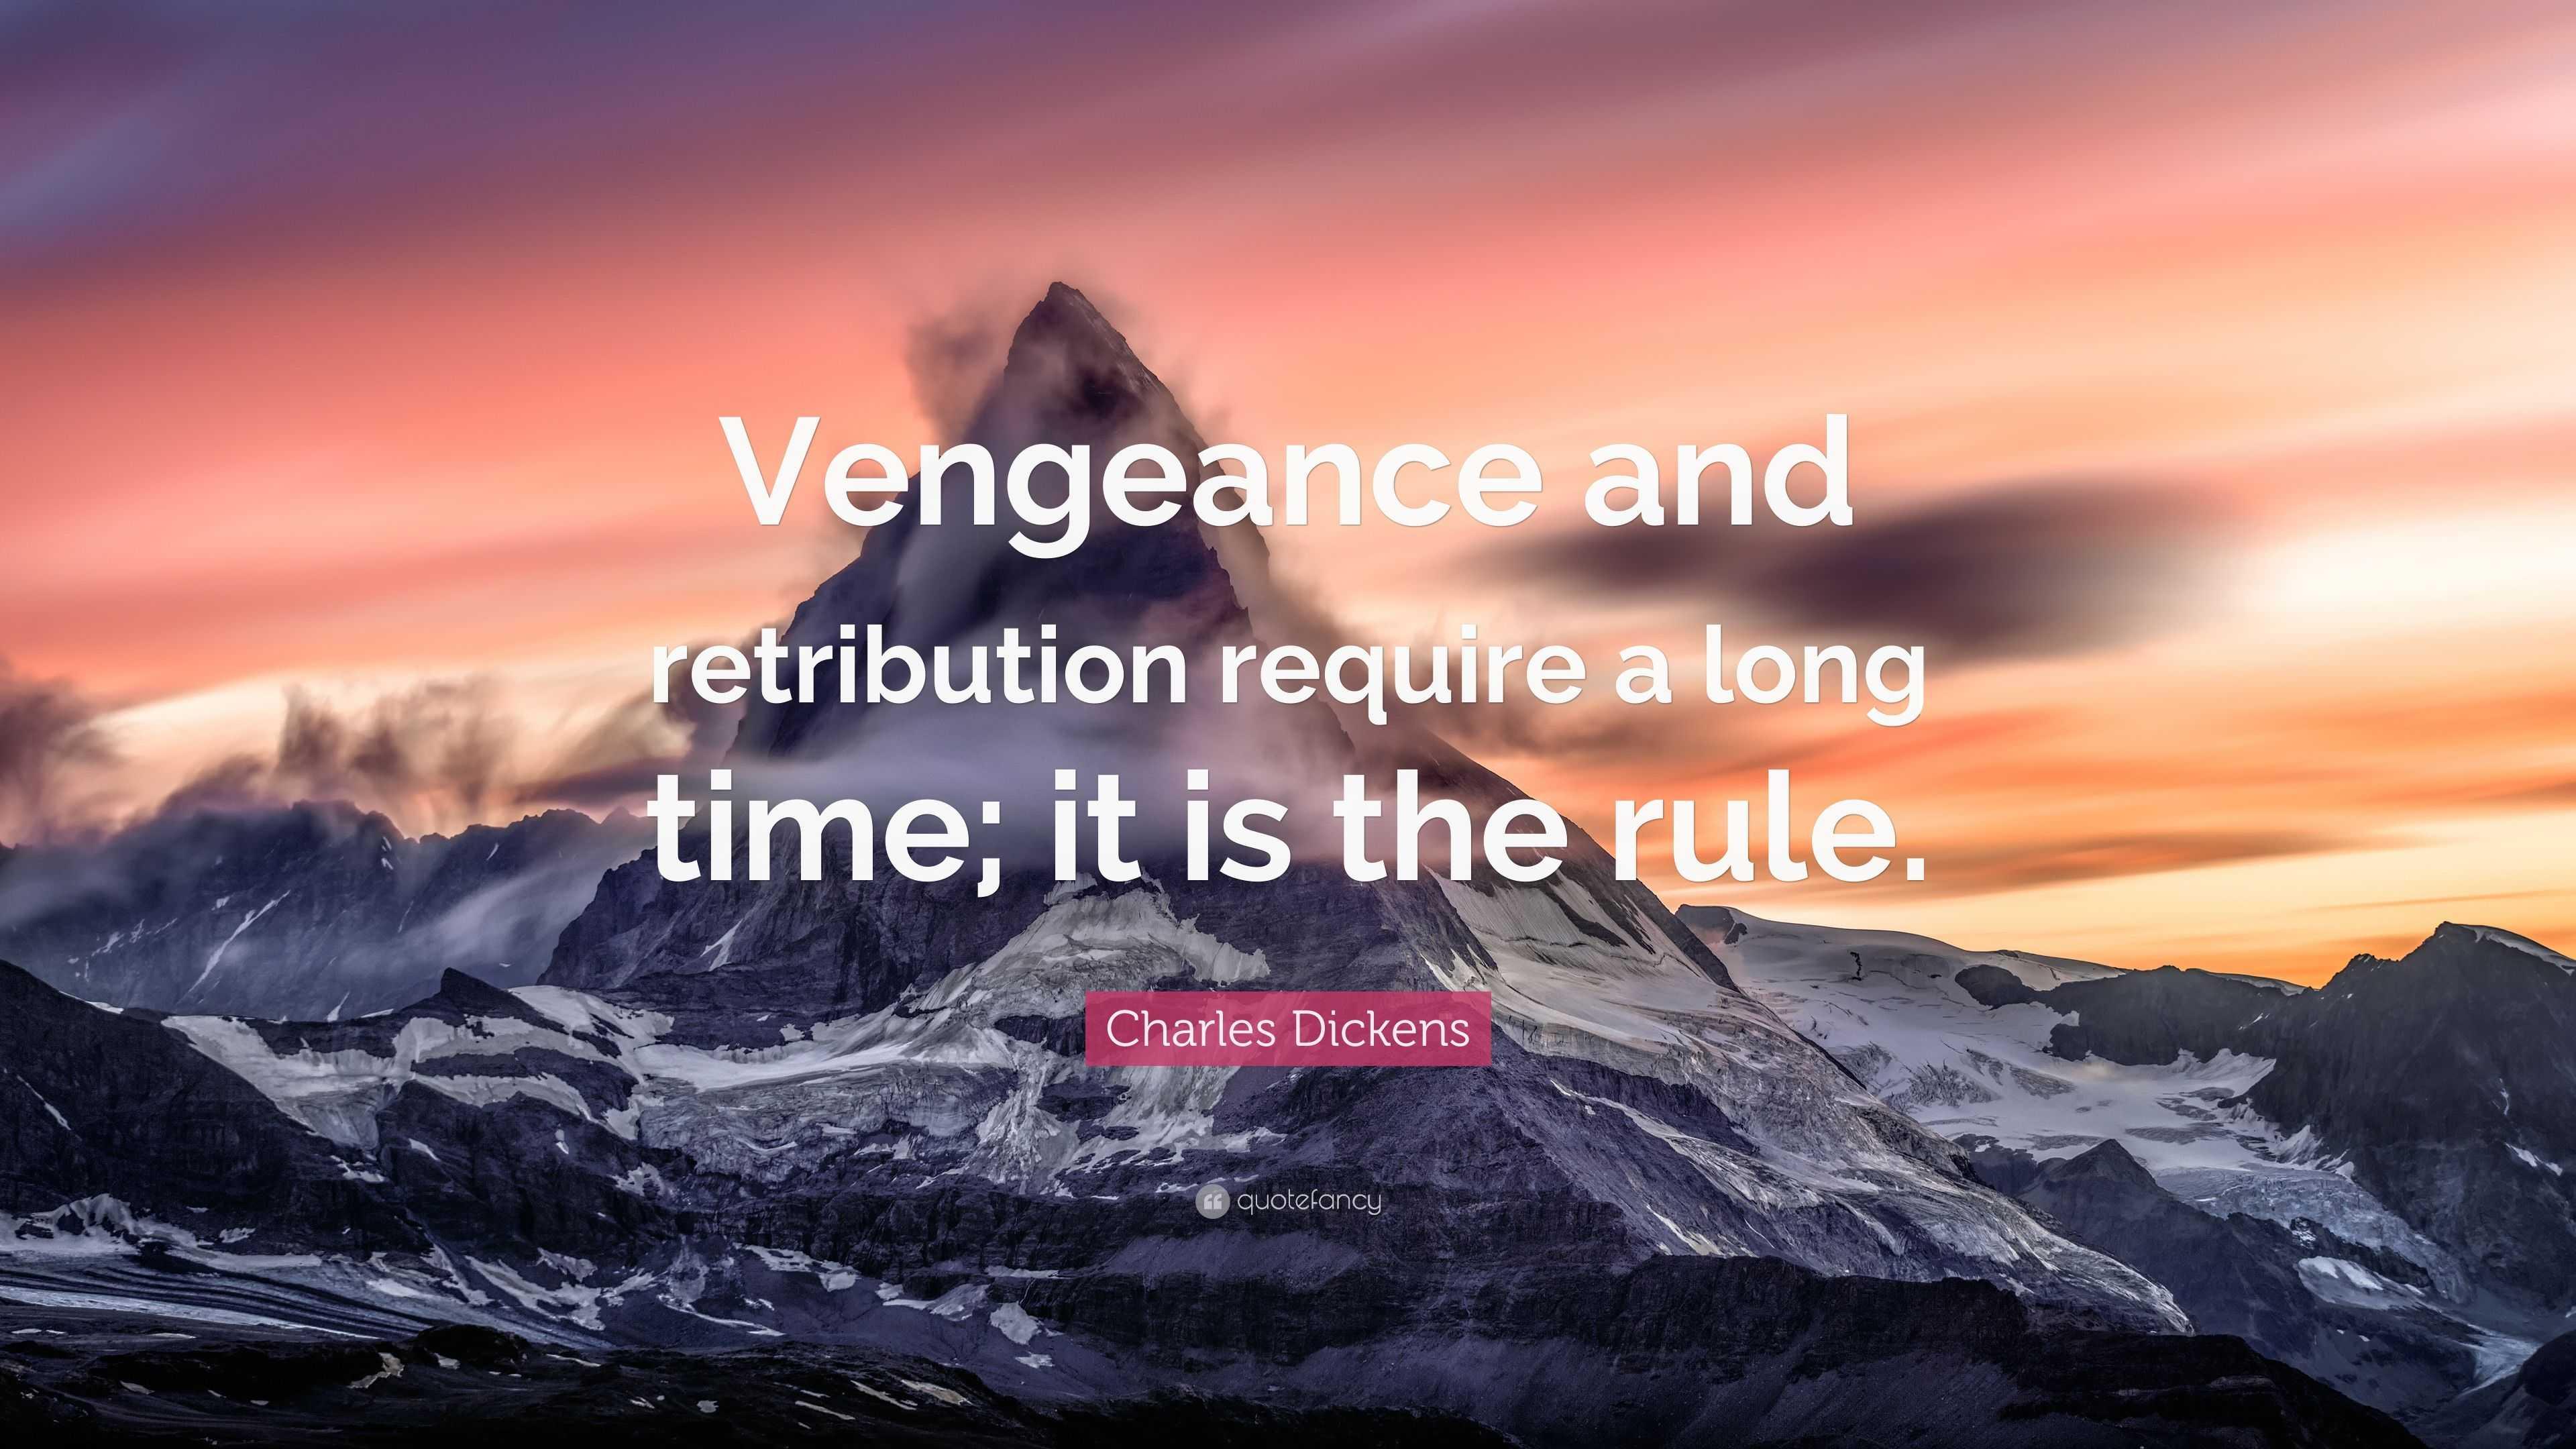 Quotes Shakespeare Vengeance